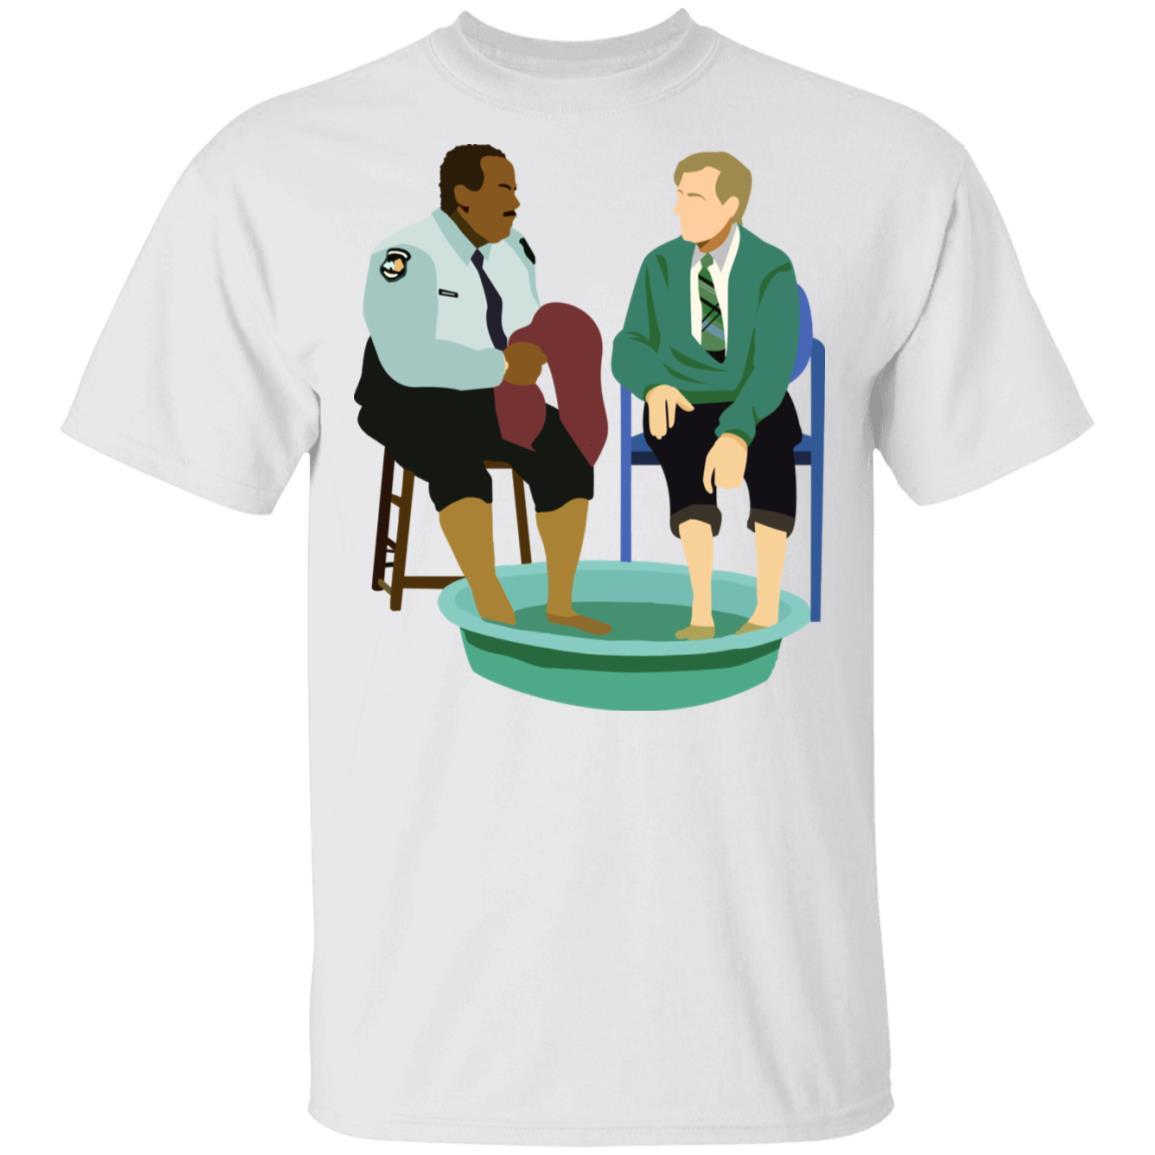 Mister Rogers Shirt Mister Rogers Neighborhood Mr Rogers And Officer Clemmons T Shirt Cubebik